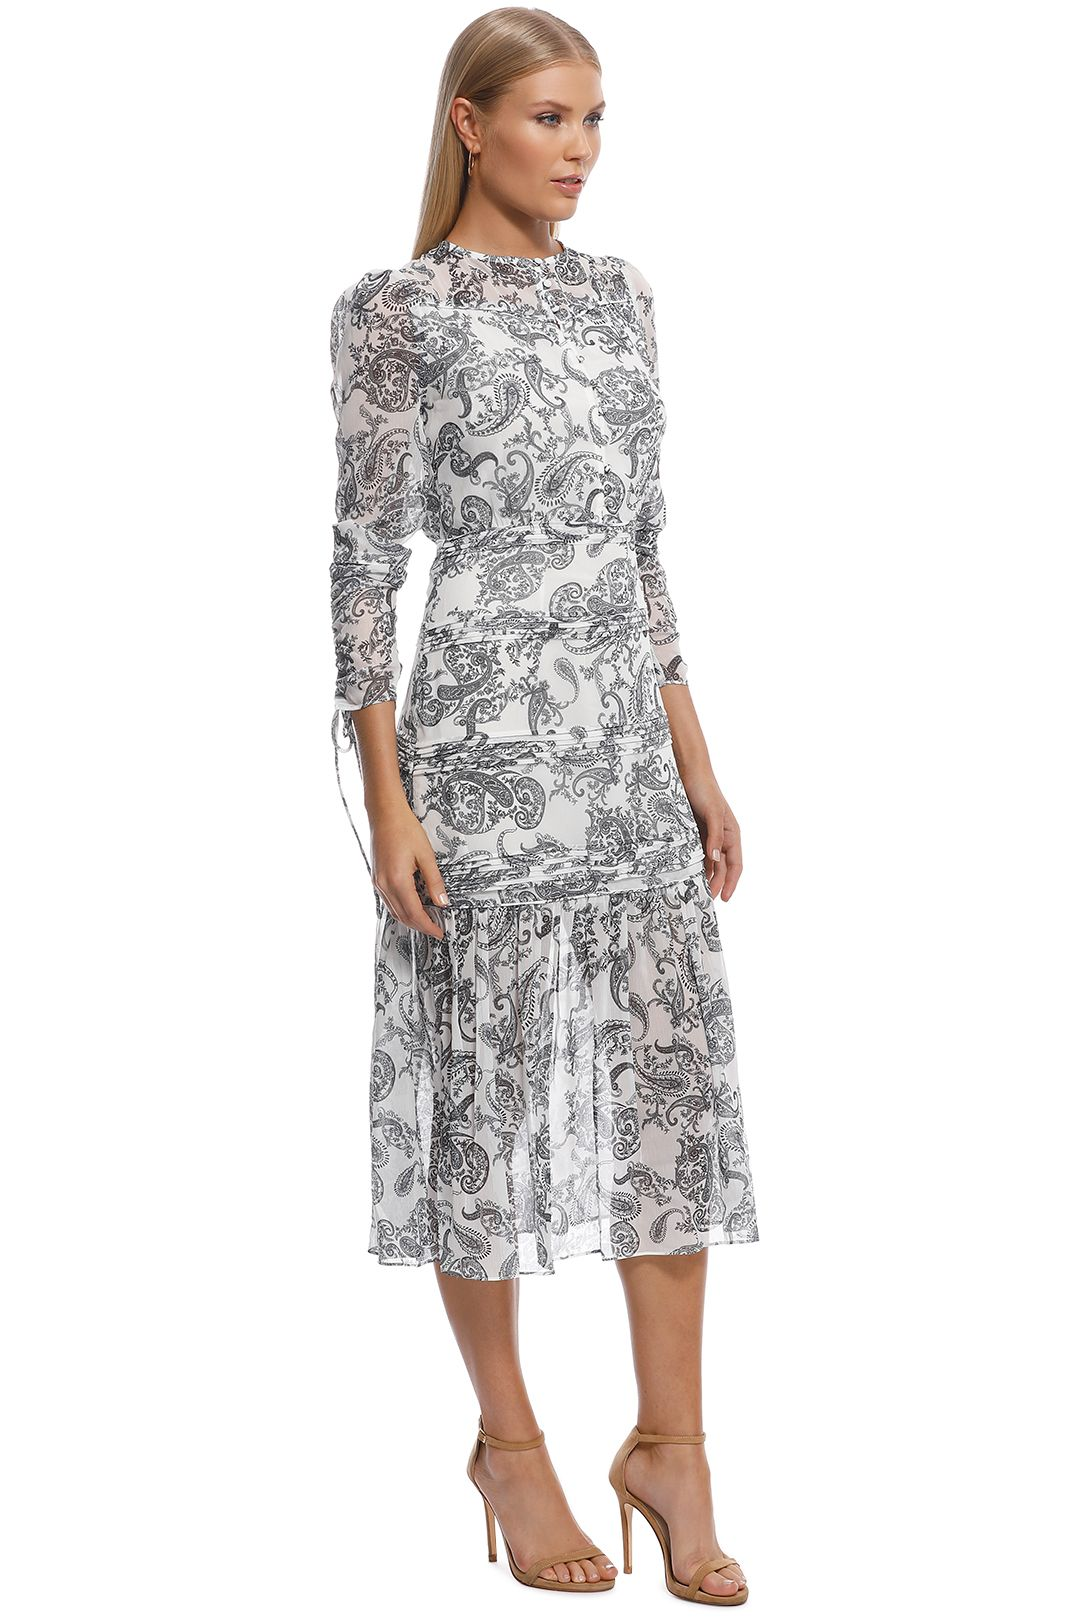 Stevie May - Cinema Midi Dress - Print - Side